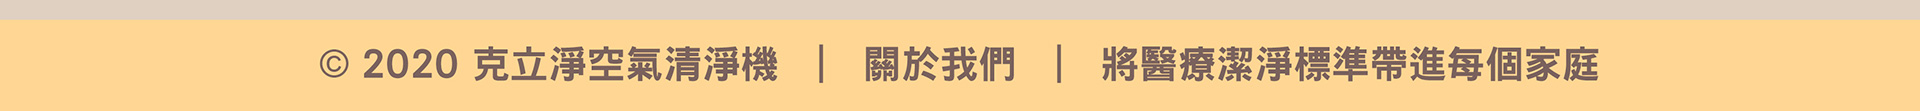 Final克立淨-20200220-PC-1-01_18